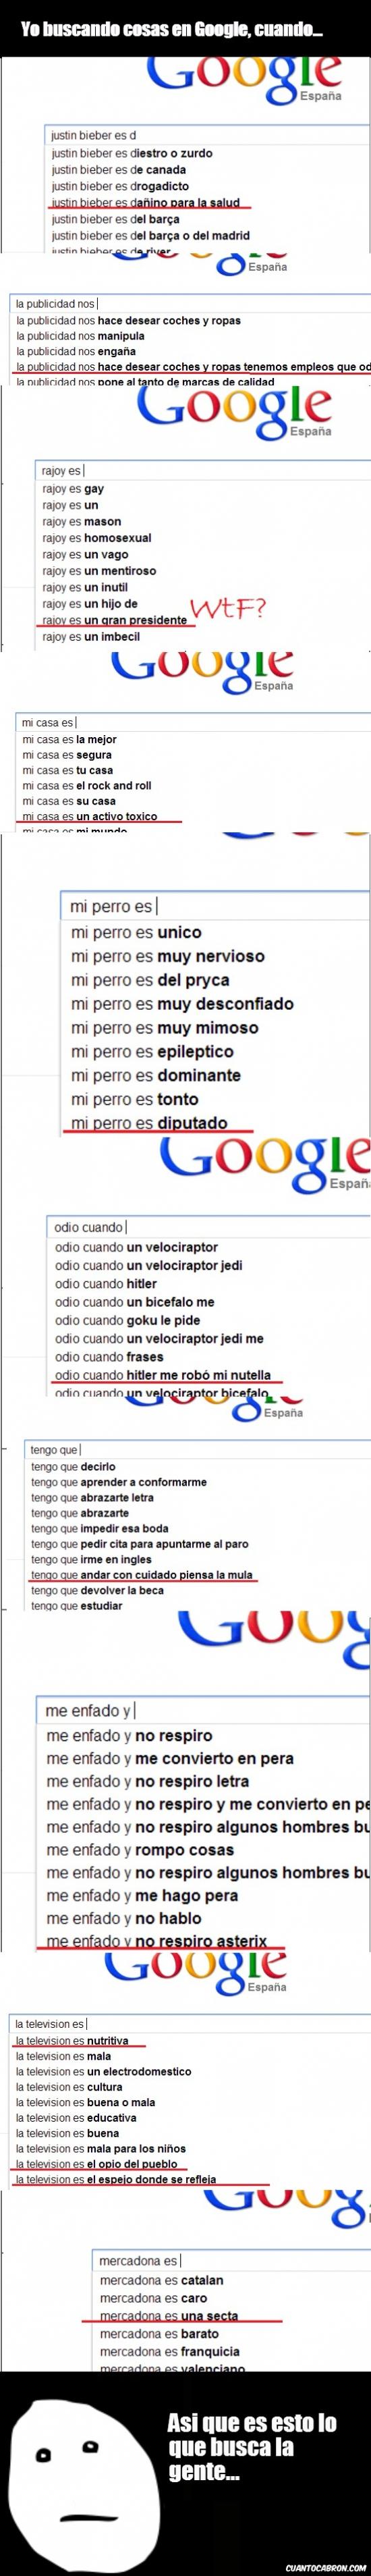 Pokerface - Google y sus búsquedas